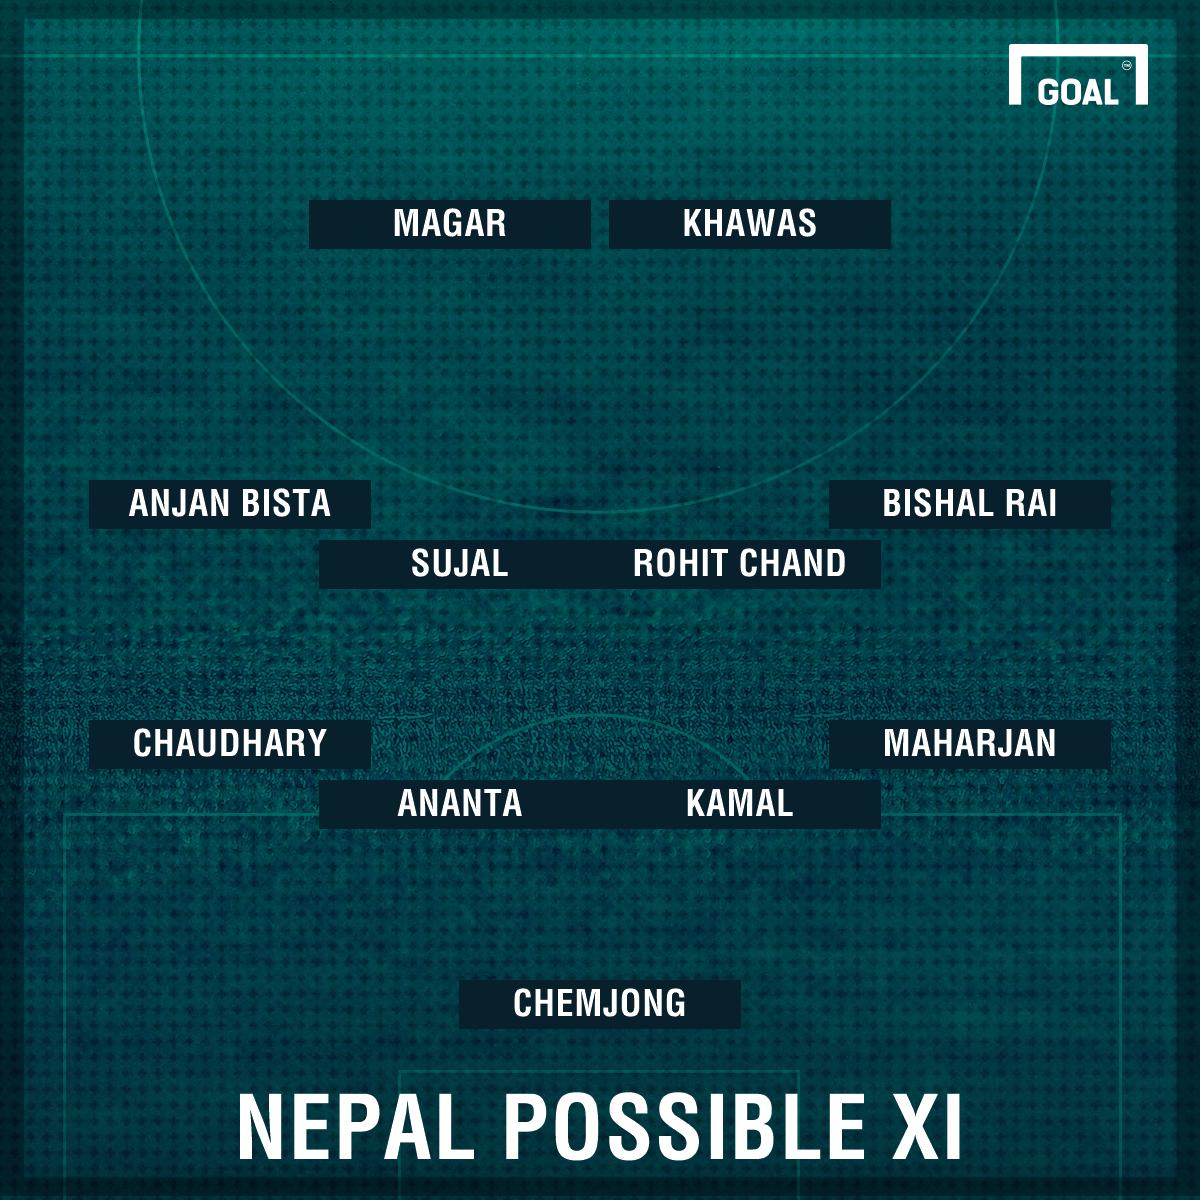 Nepal vs India Possible XI